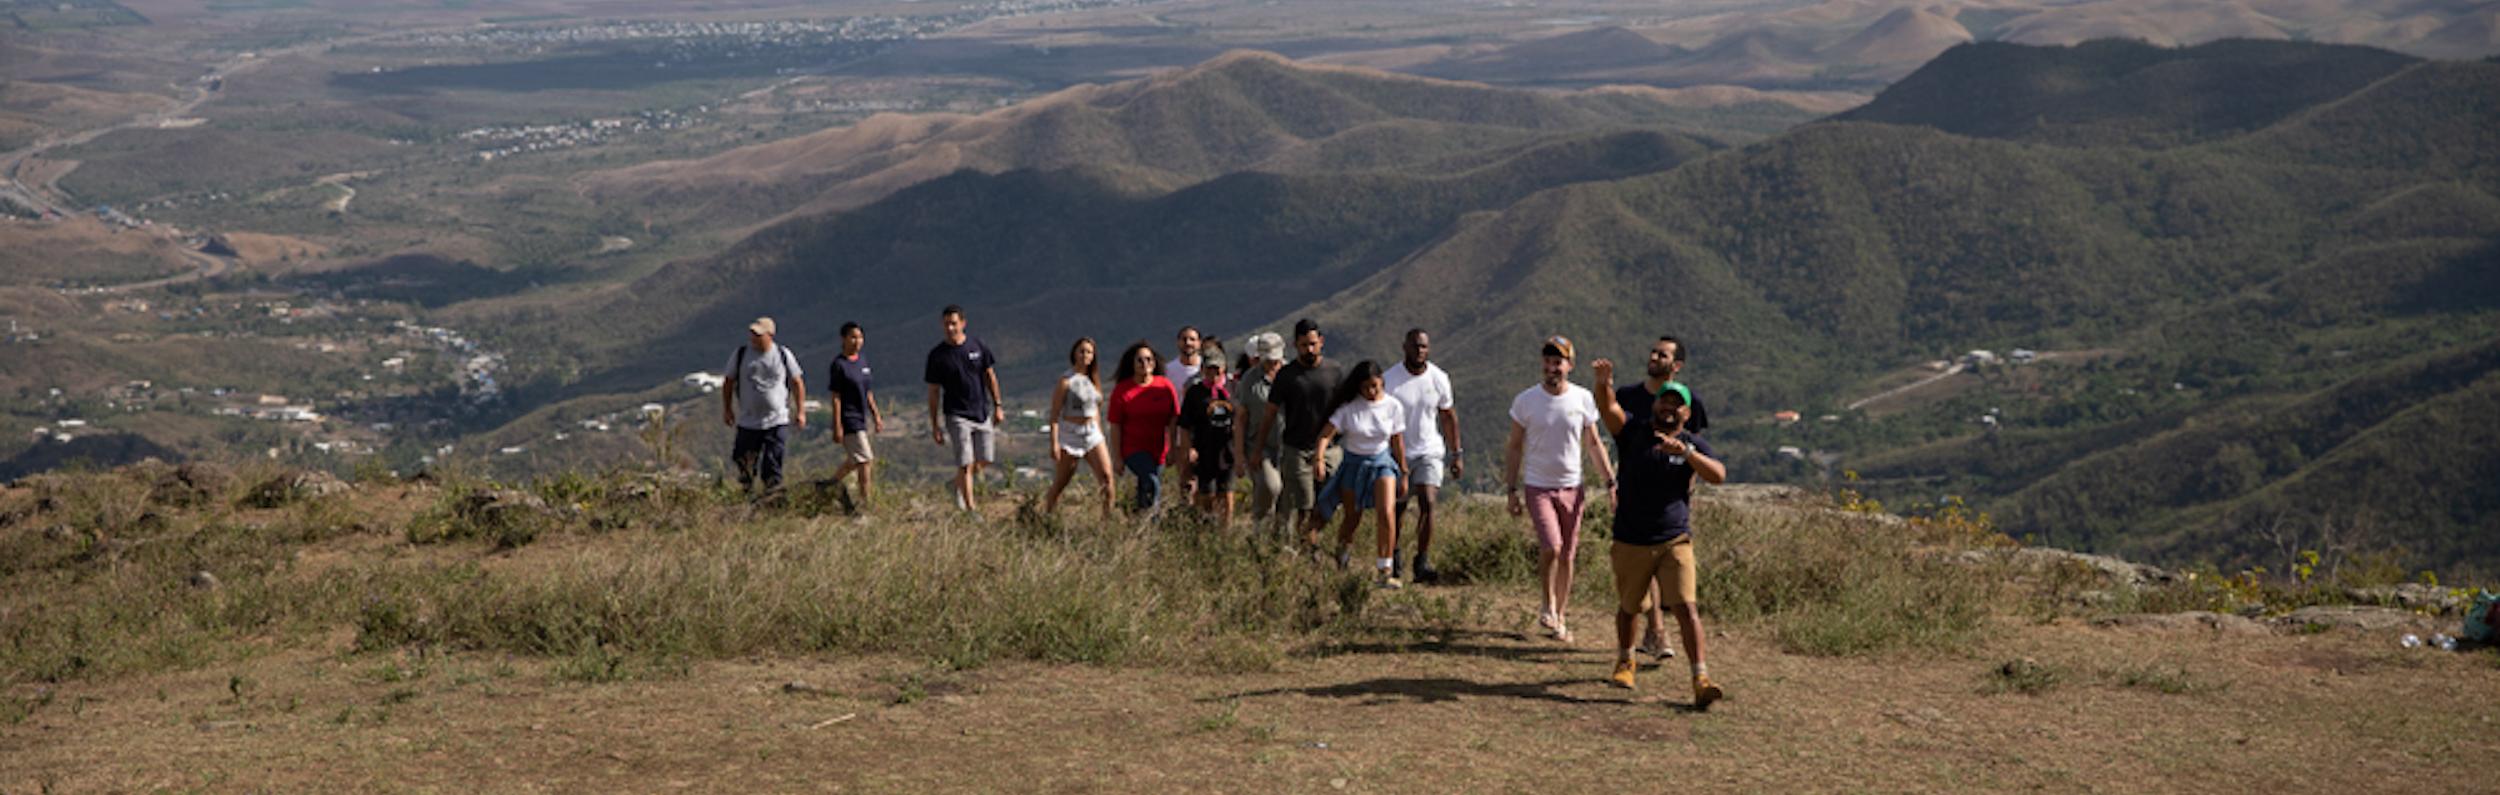 Girls hiking